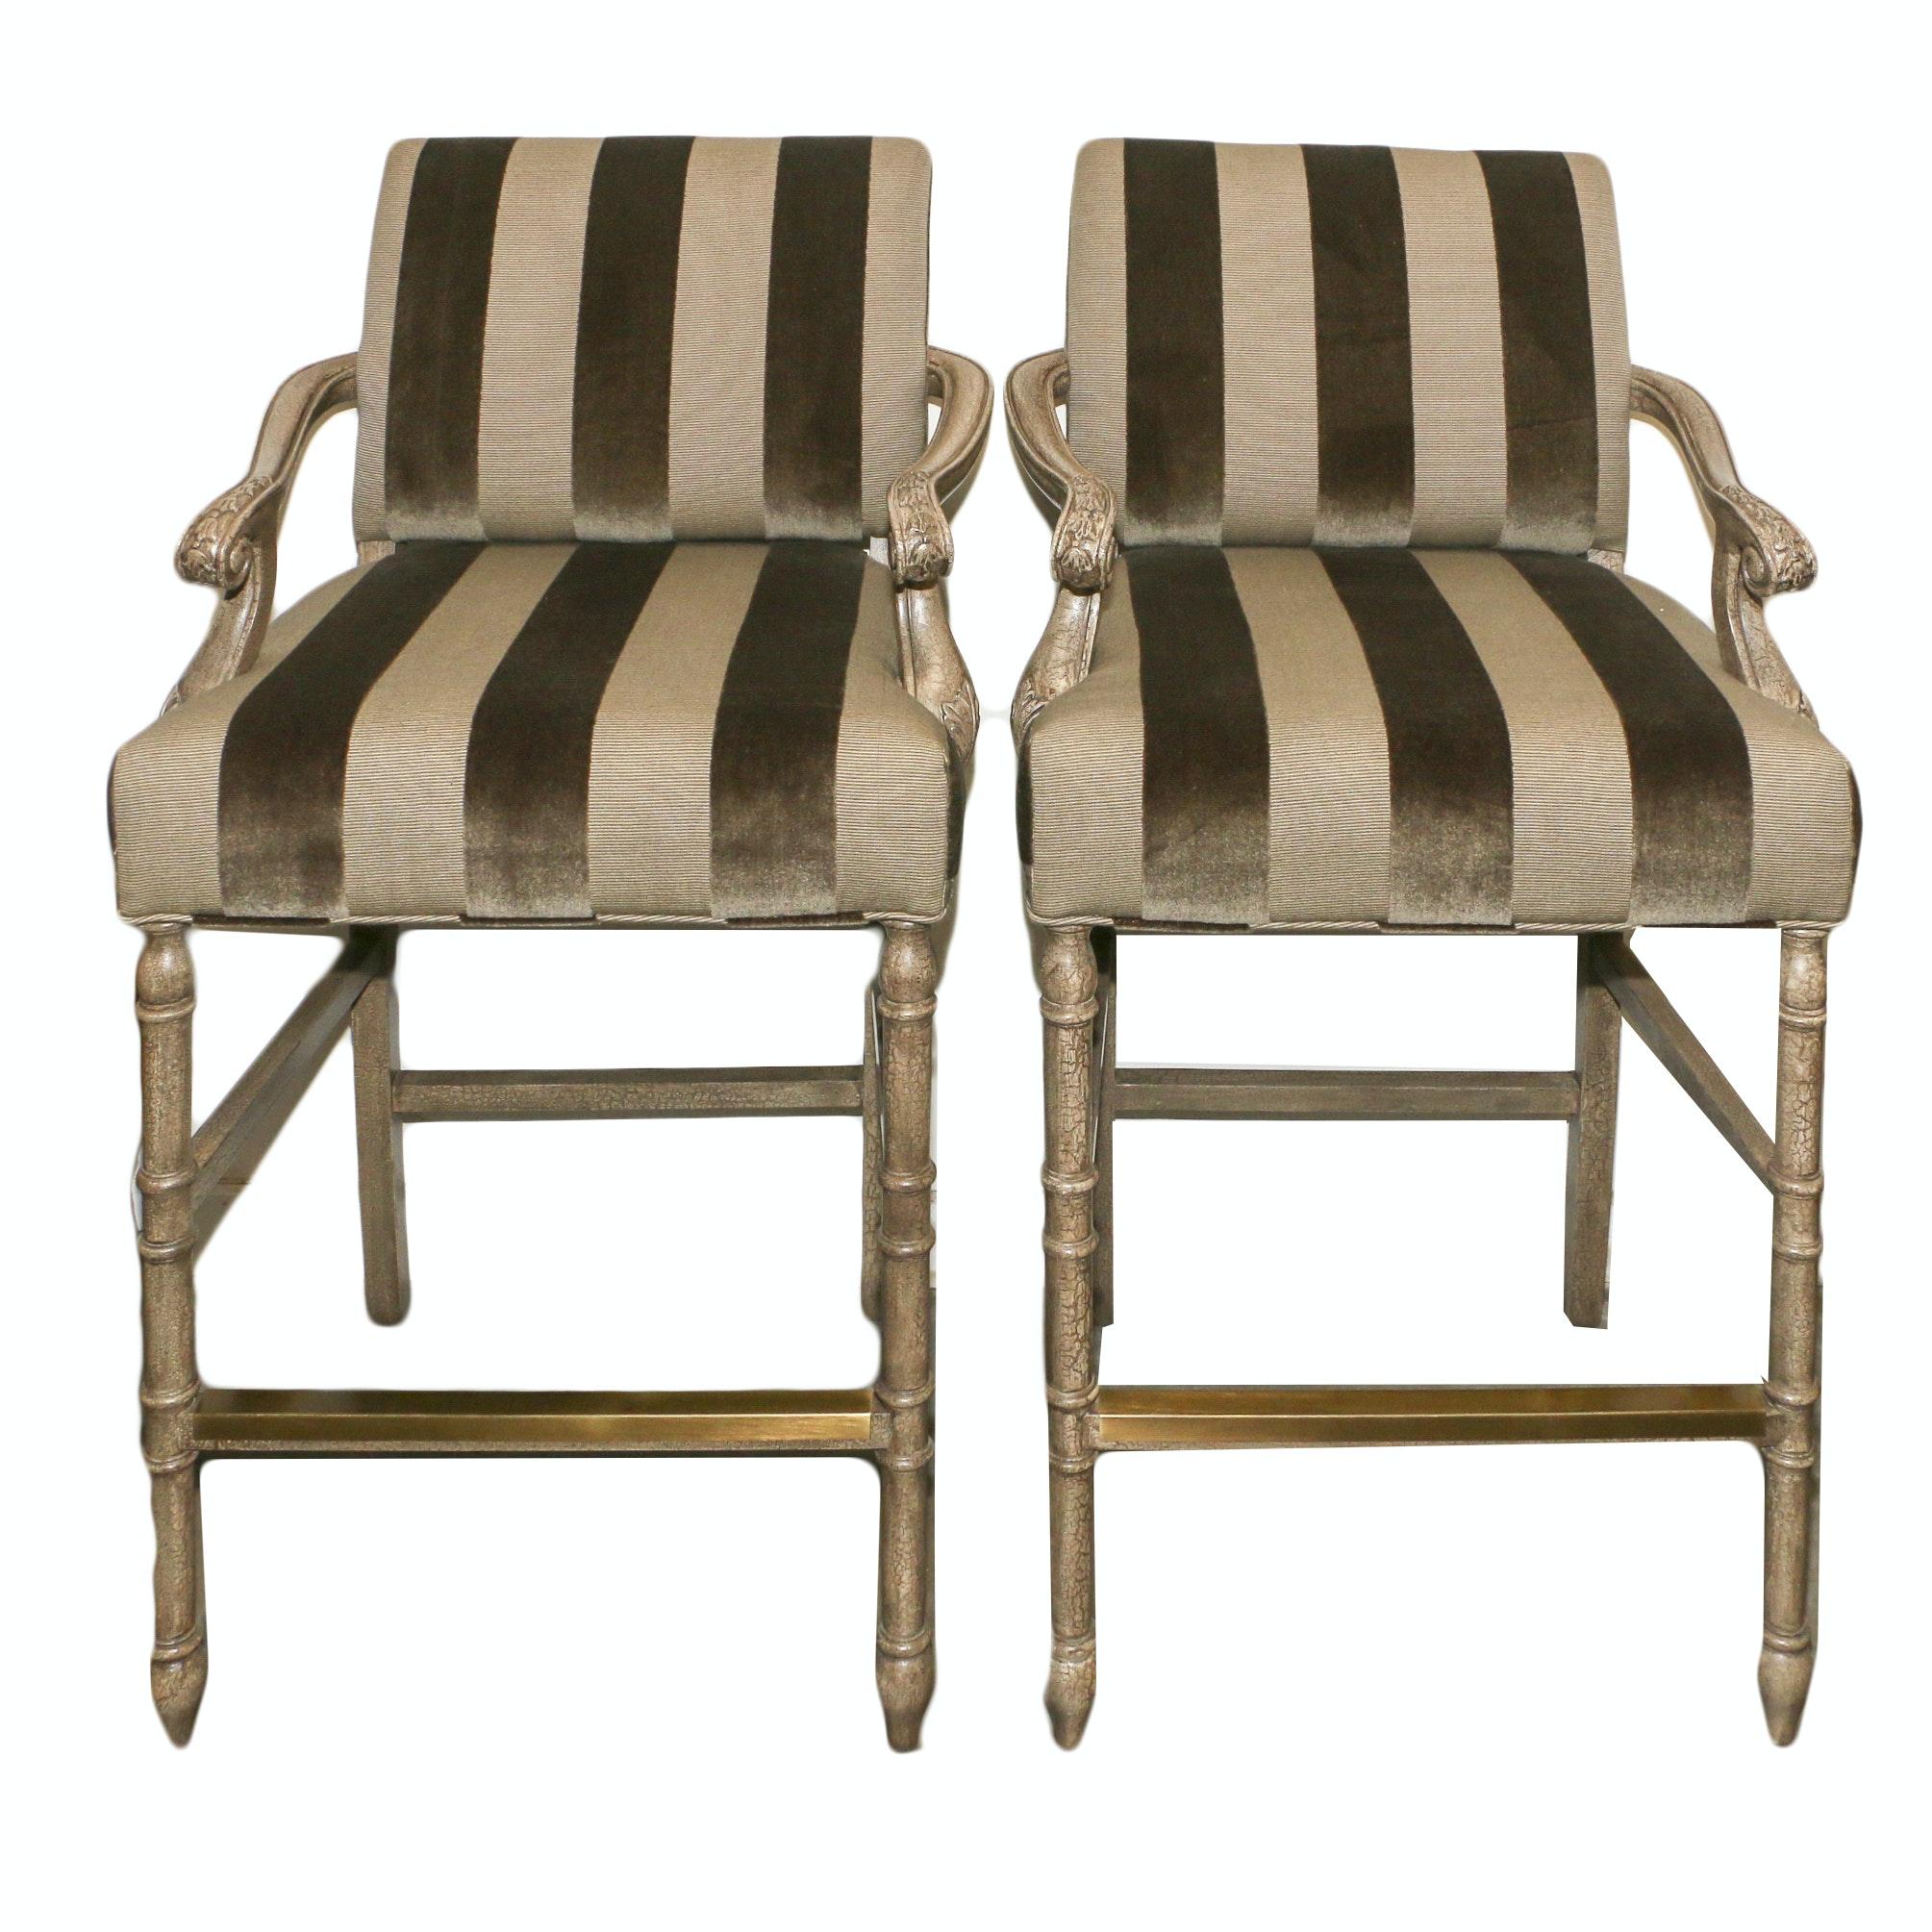 Louis XVI Style Painted Wood Frame Upholstered Barstools, 21st Century